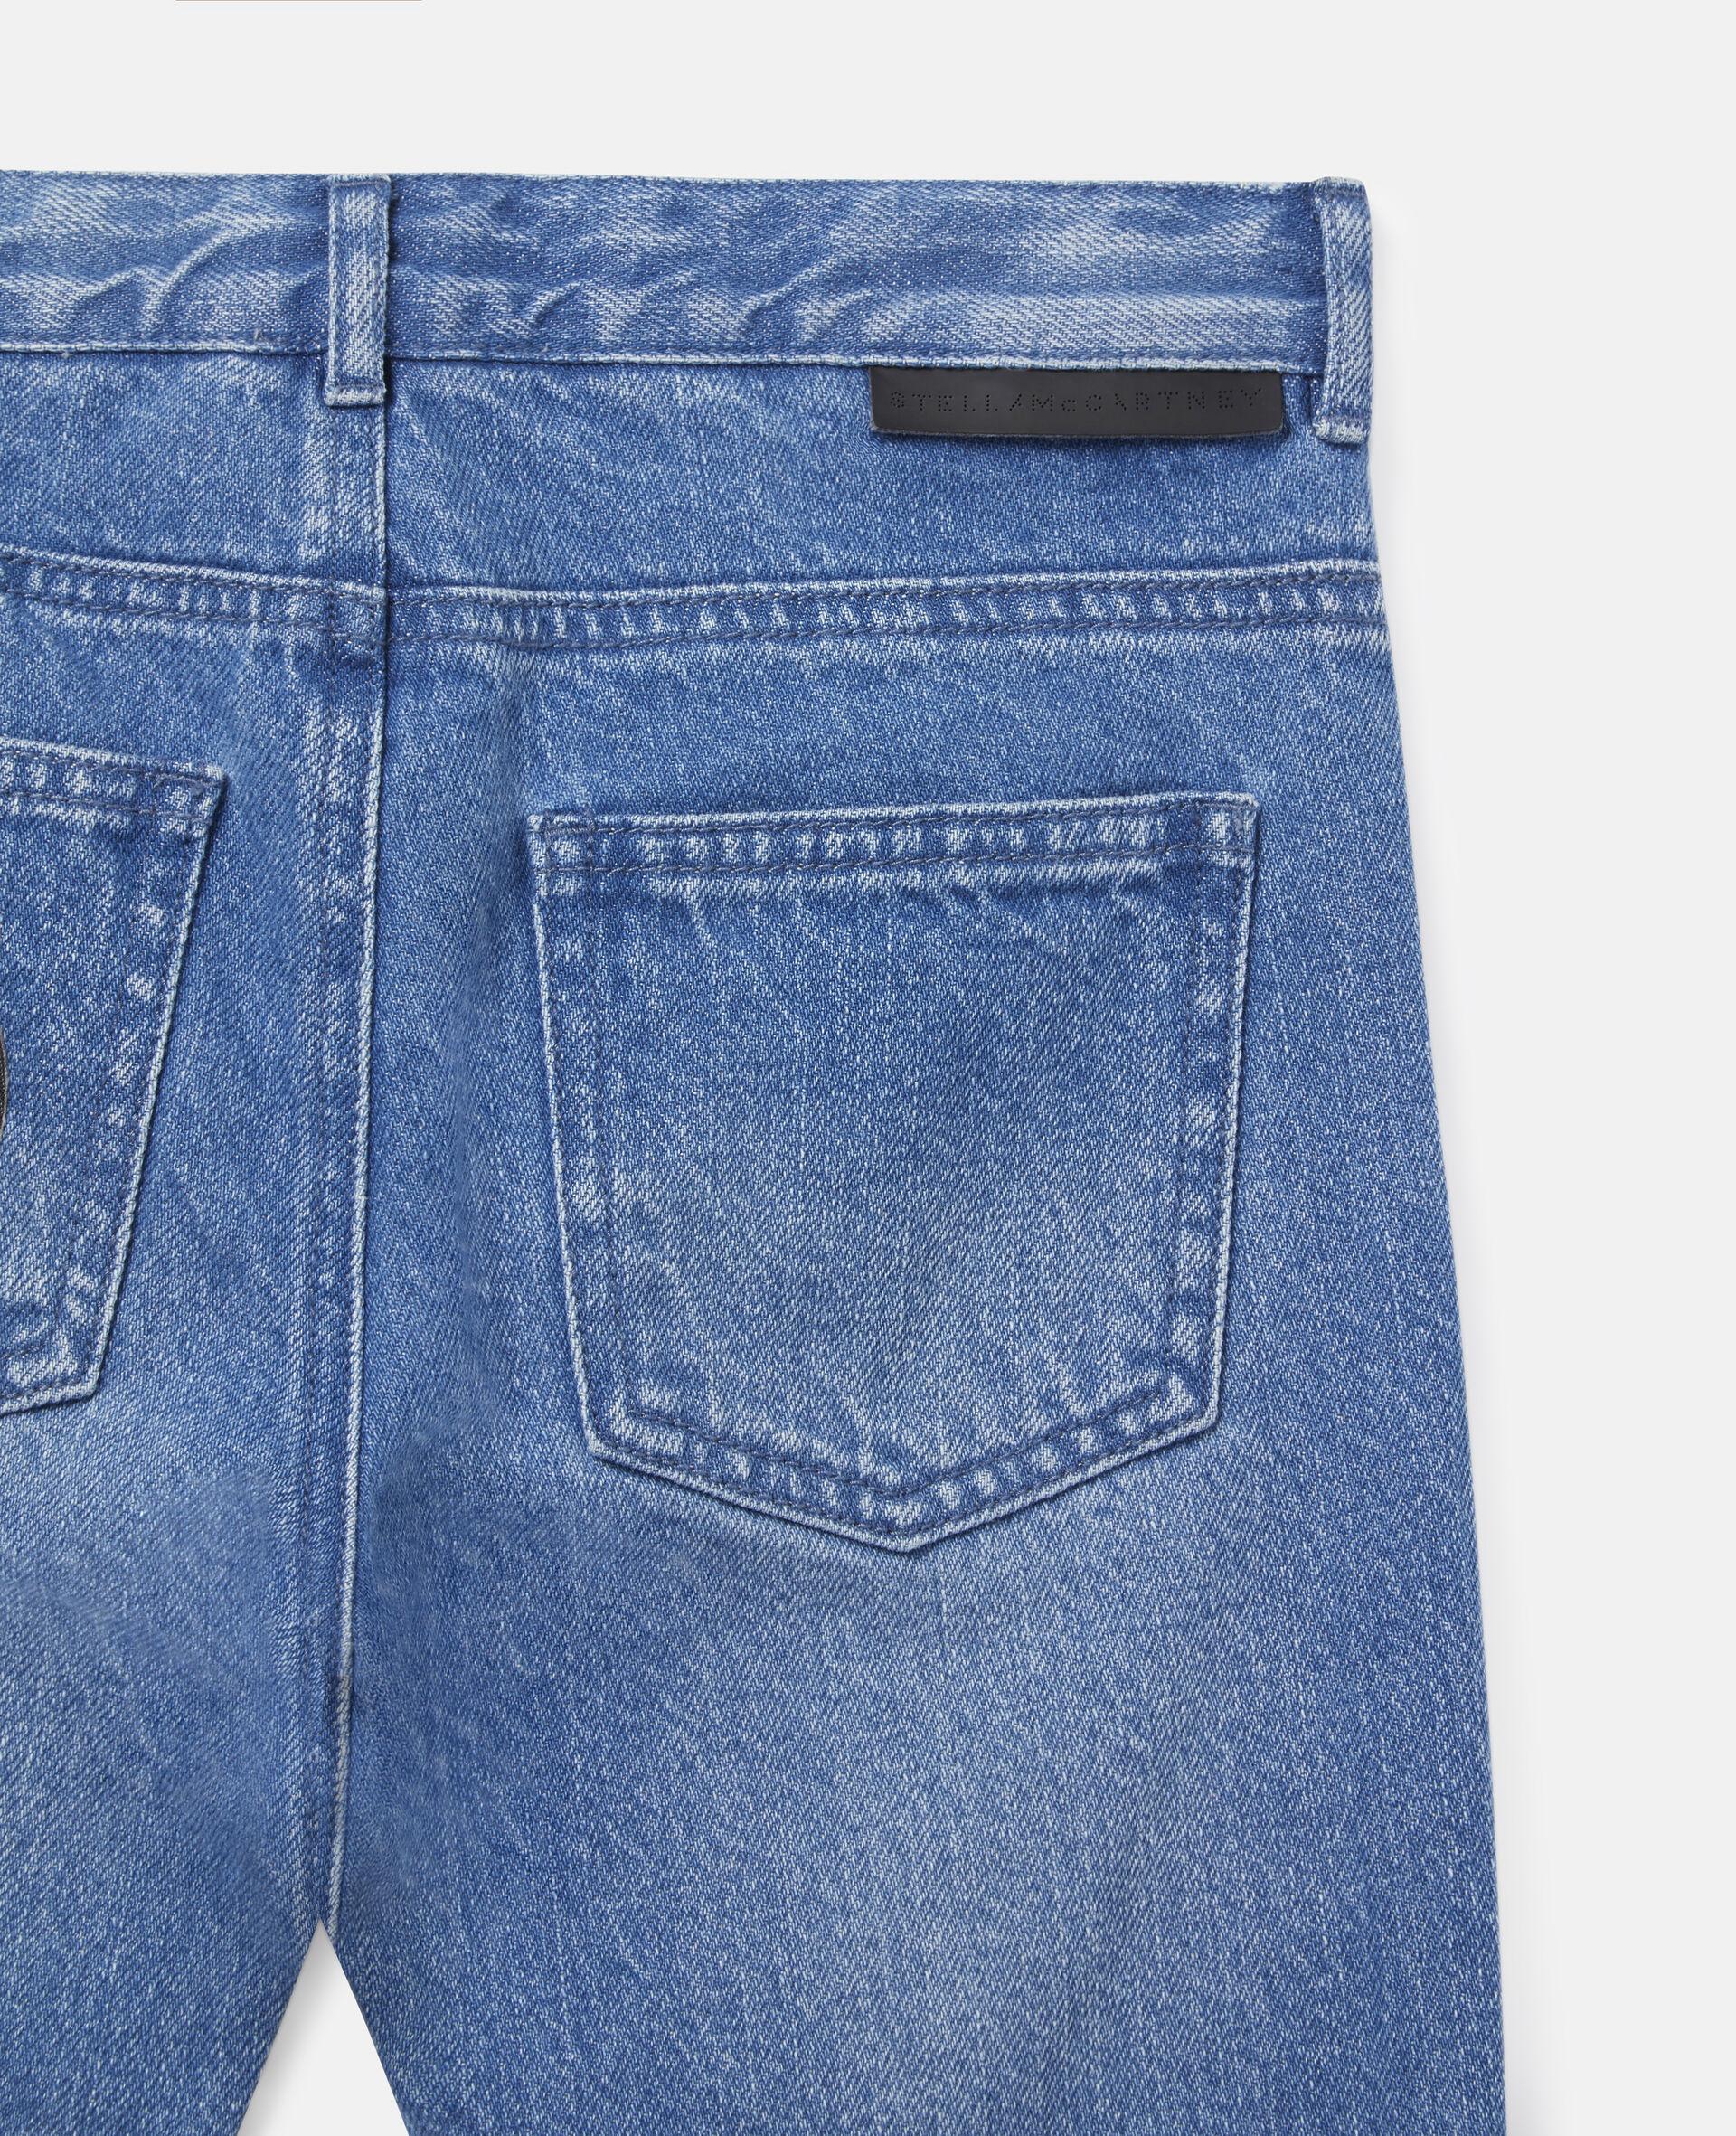 Doggies Badges Denim Trousers-Blue-large image number 1